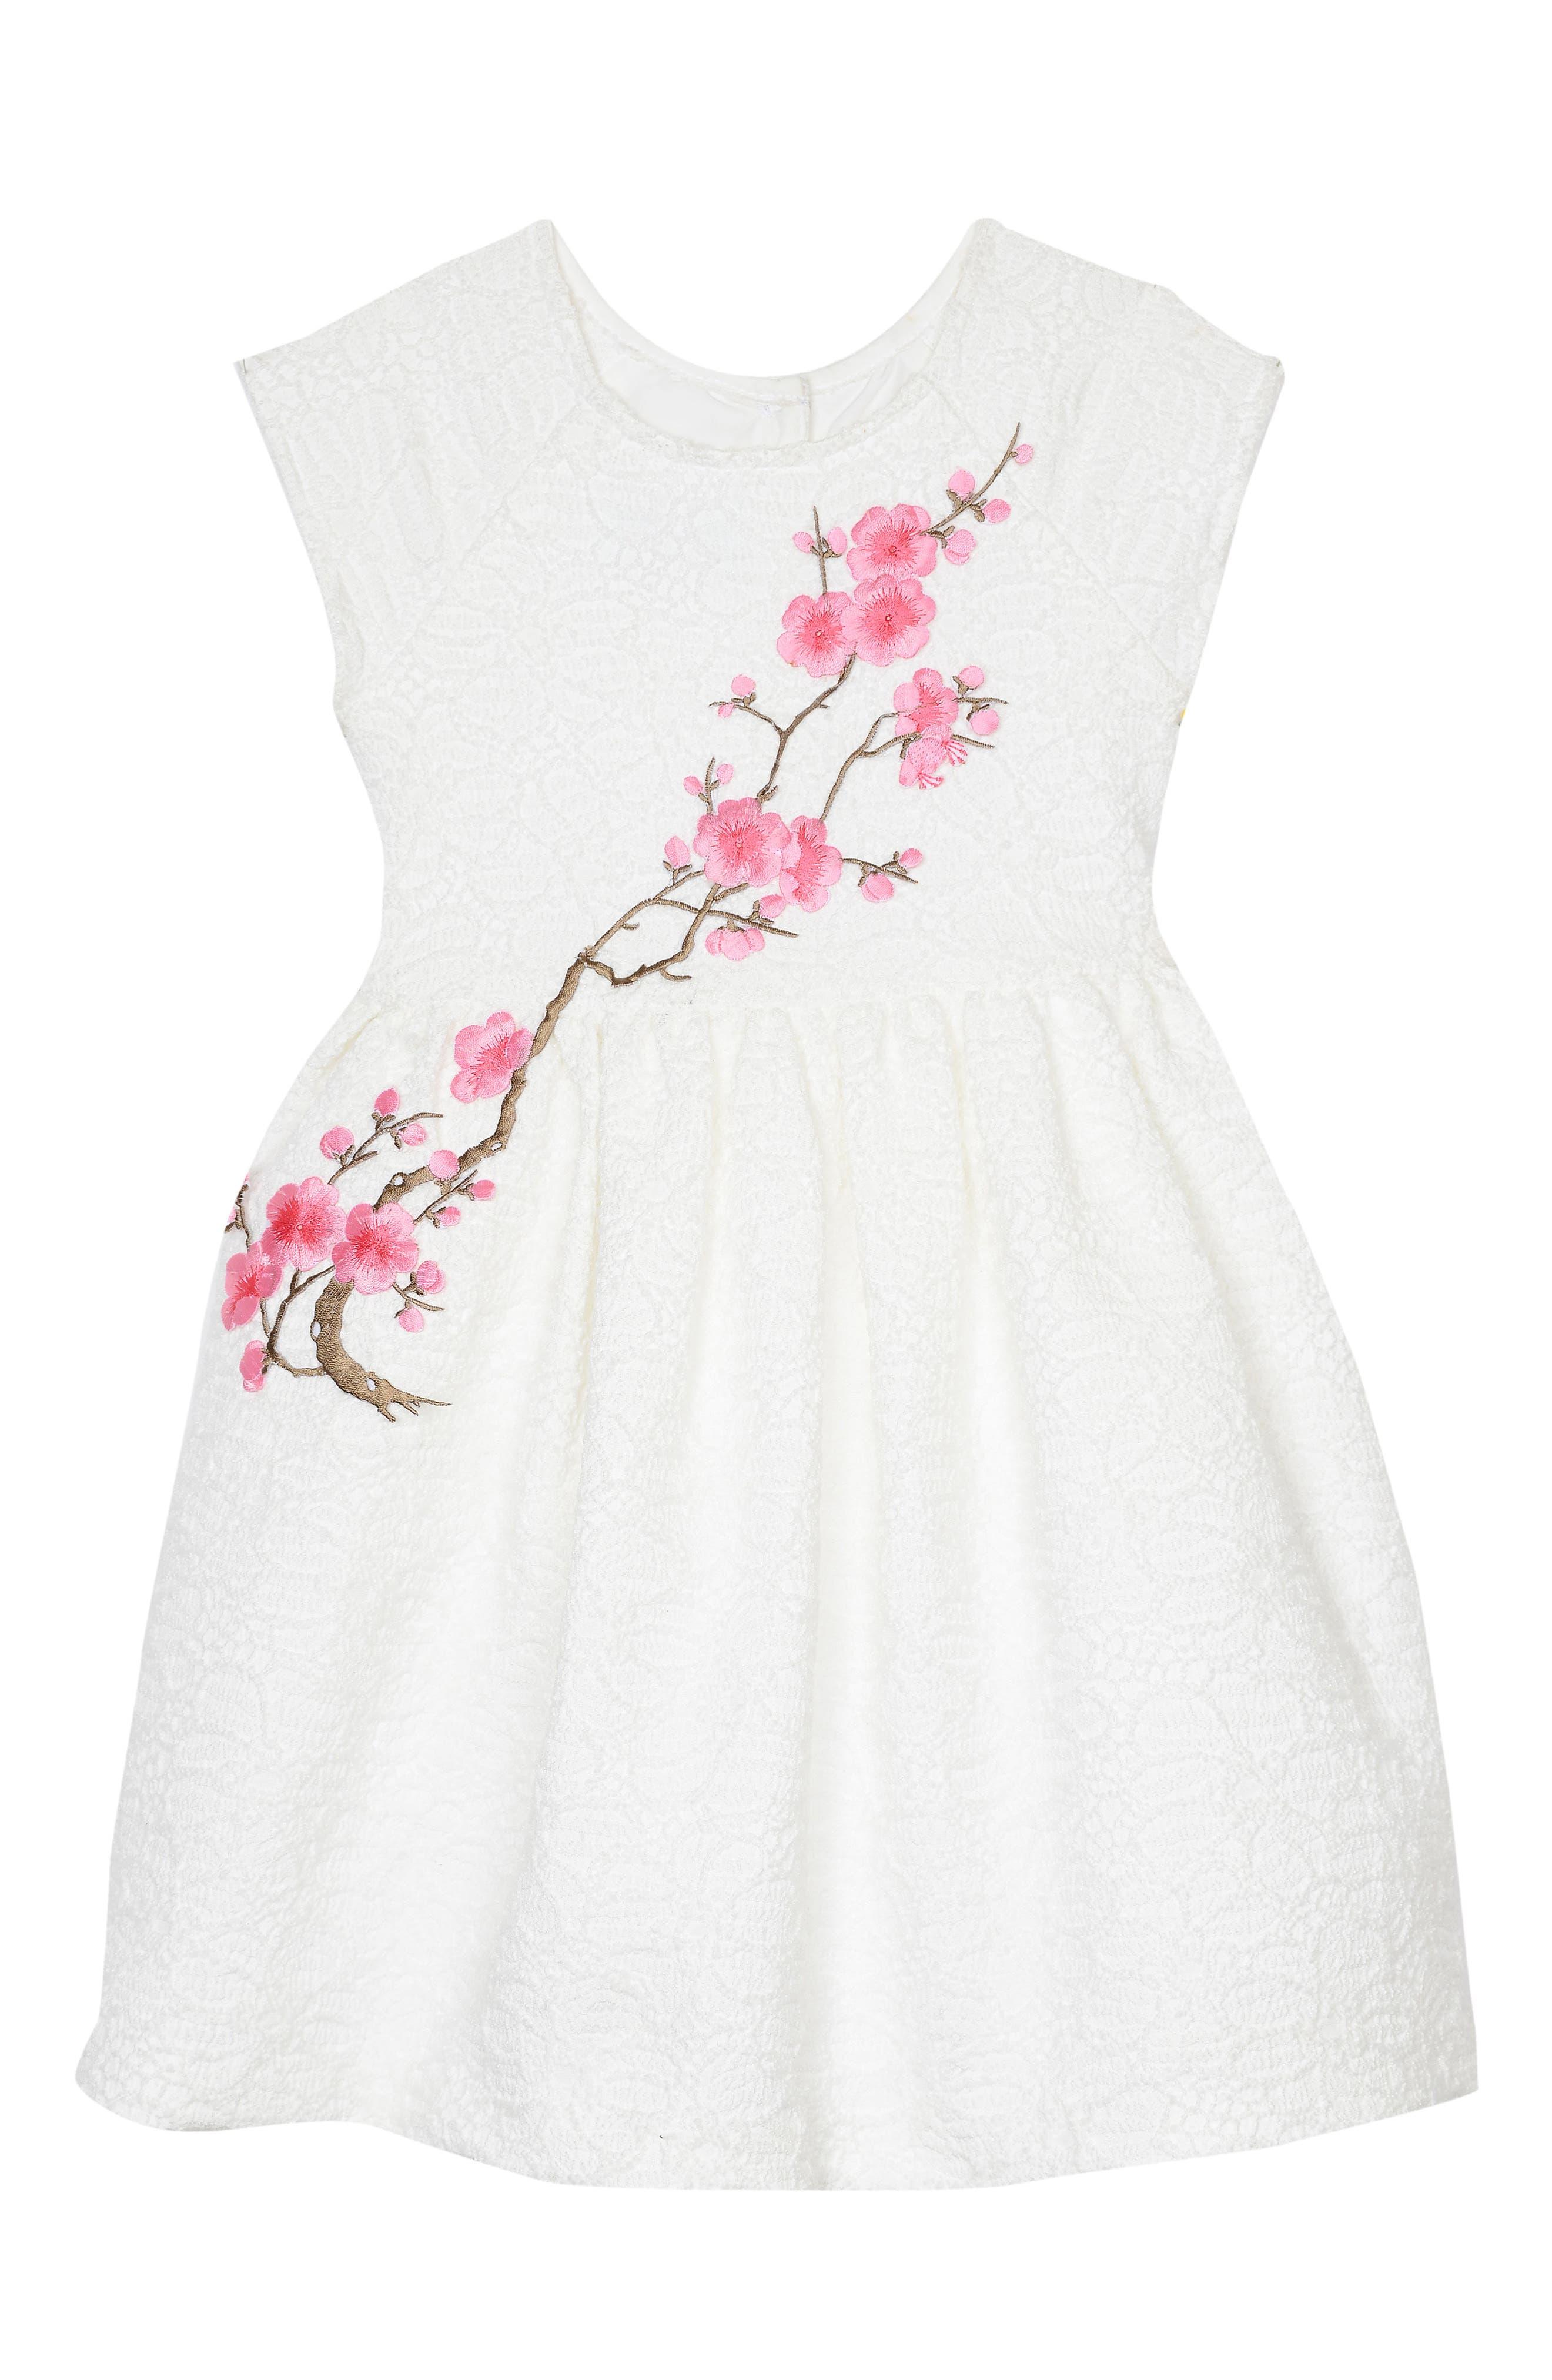 Cherry Blossom Dress,                             Main thumbnail 1, color,                             100